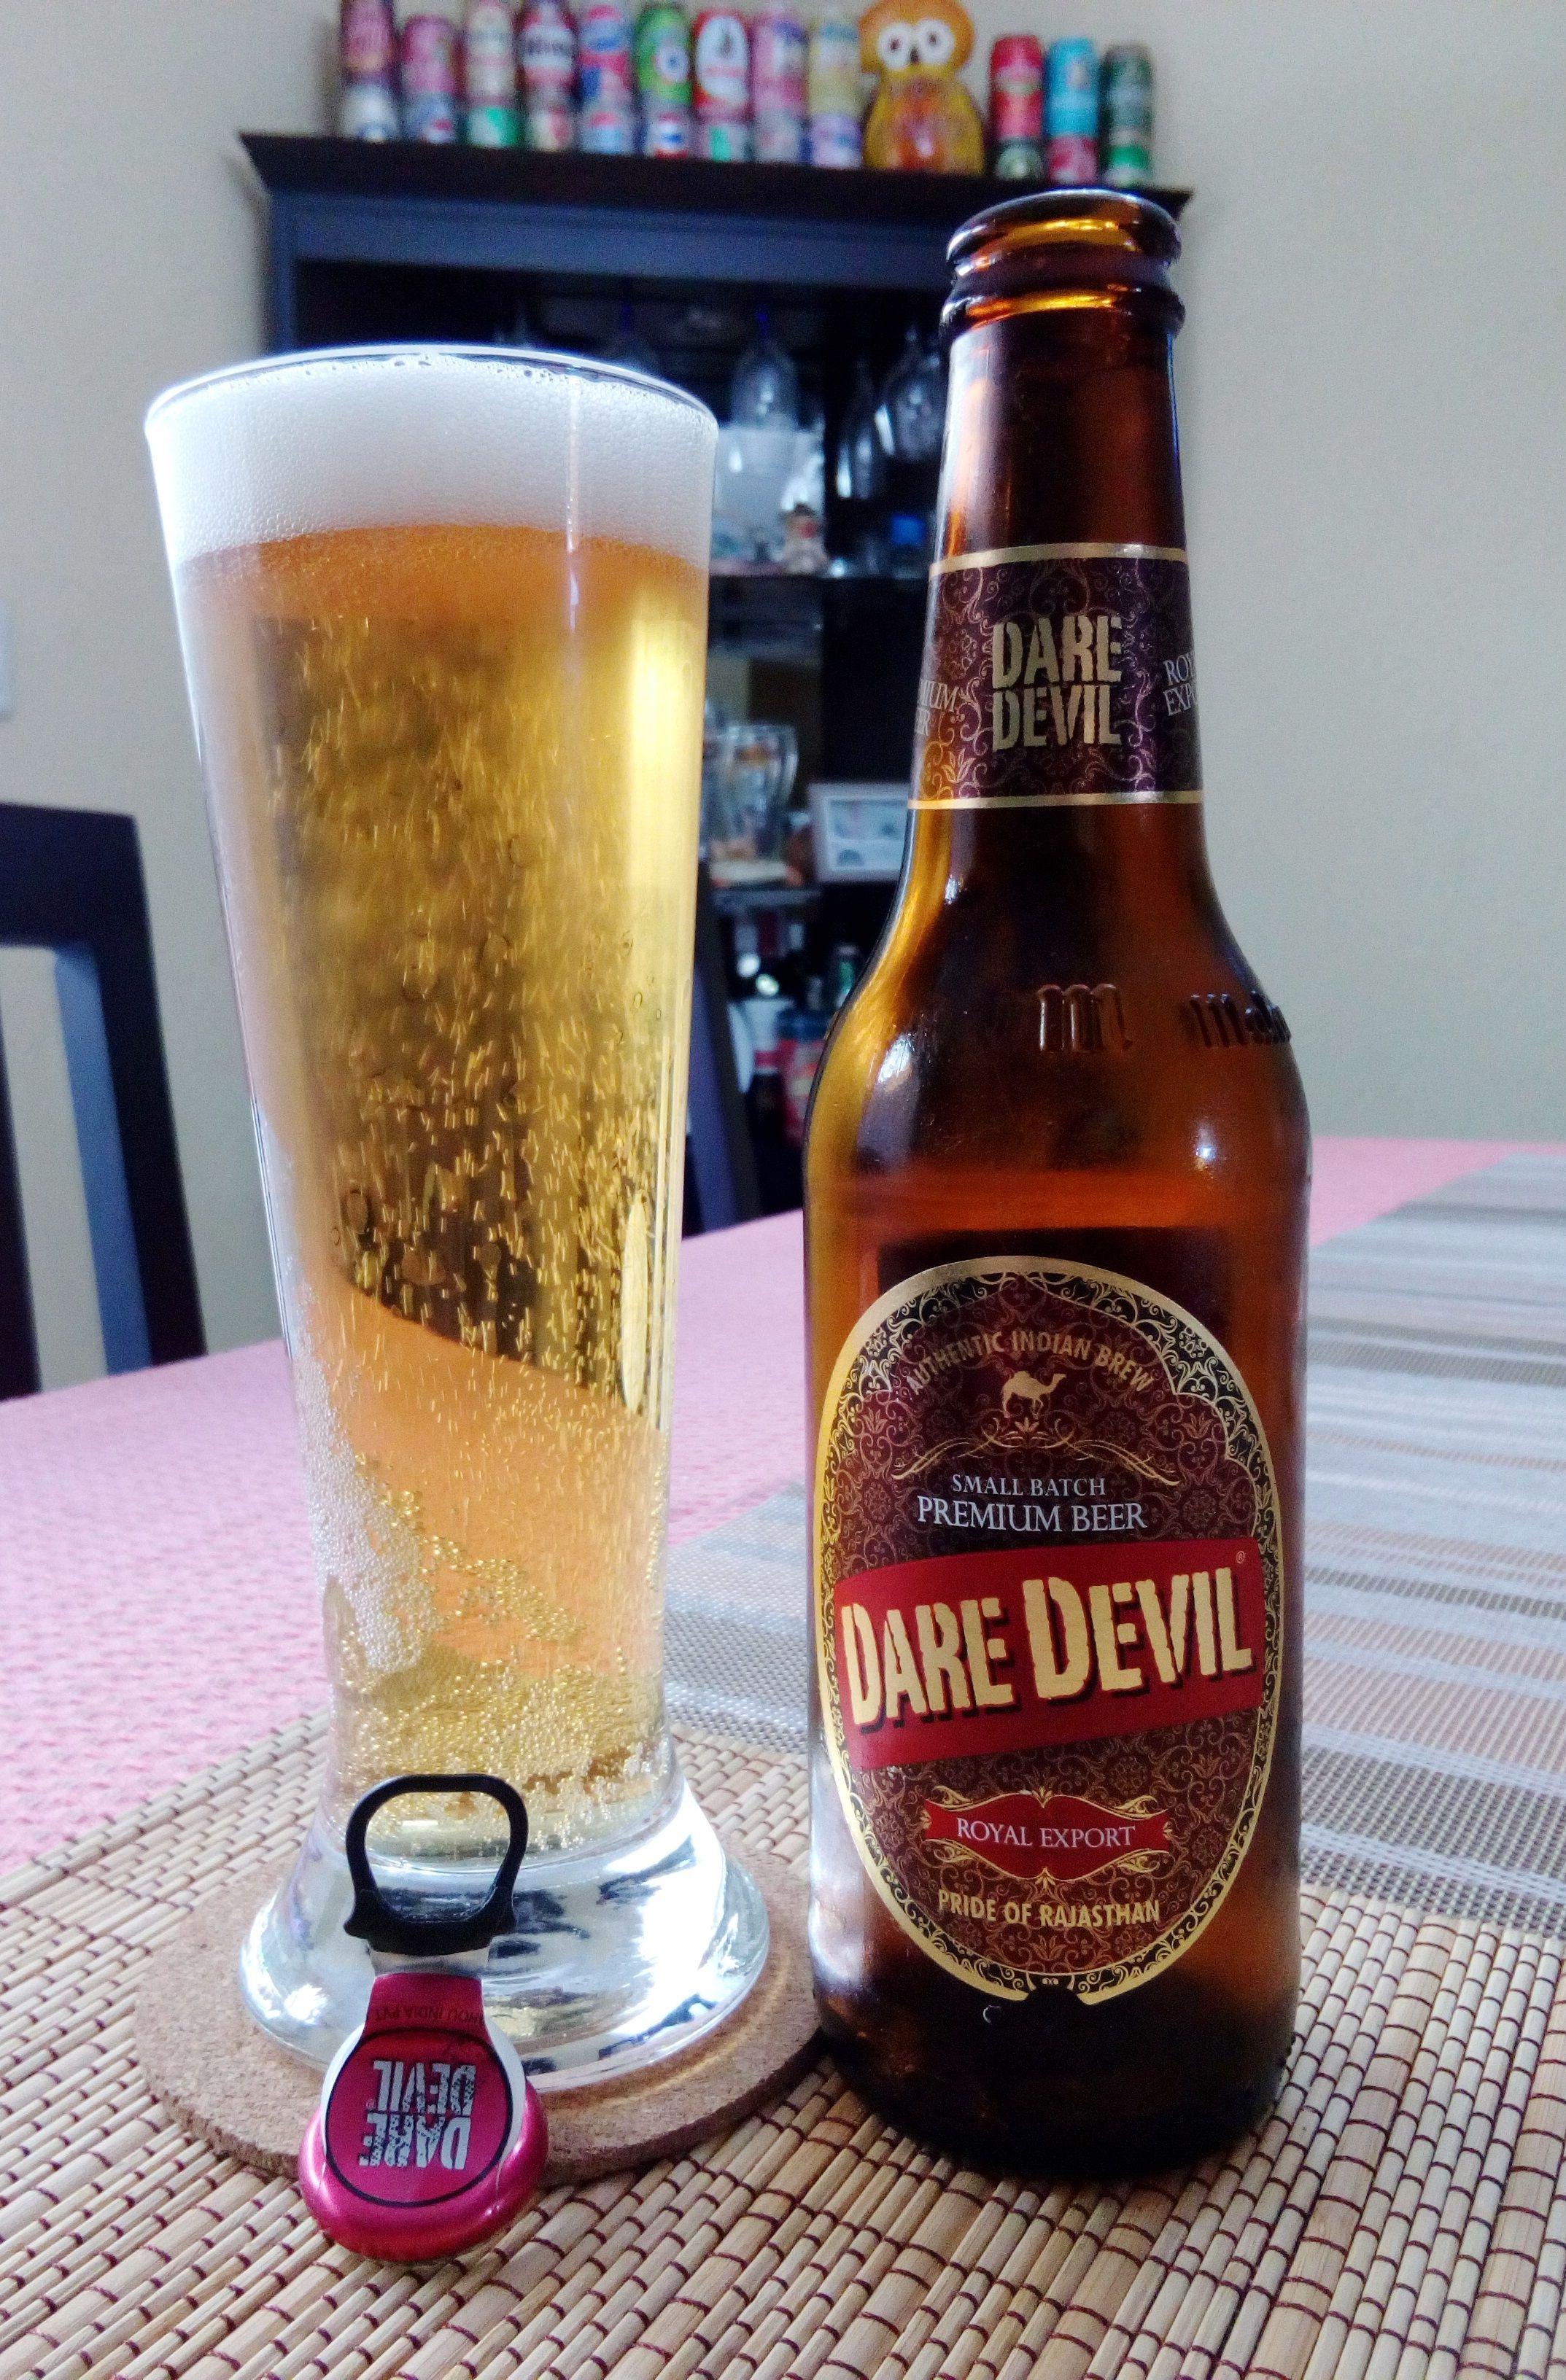 beer_brands_india_under_rs_200_dare_devil_image